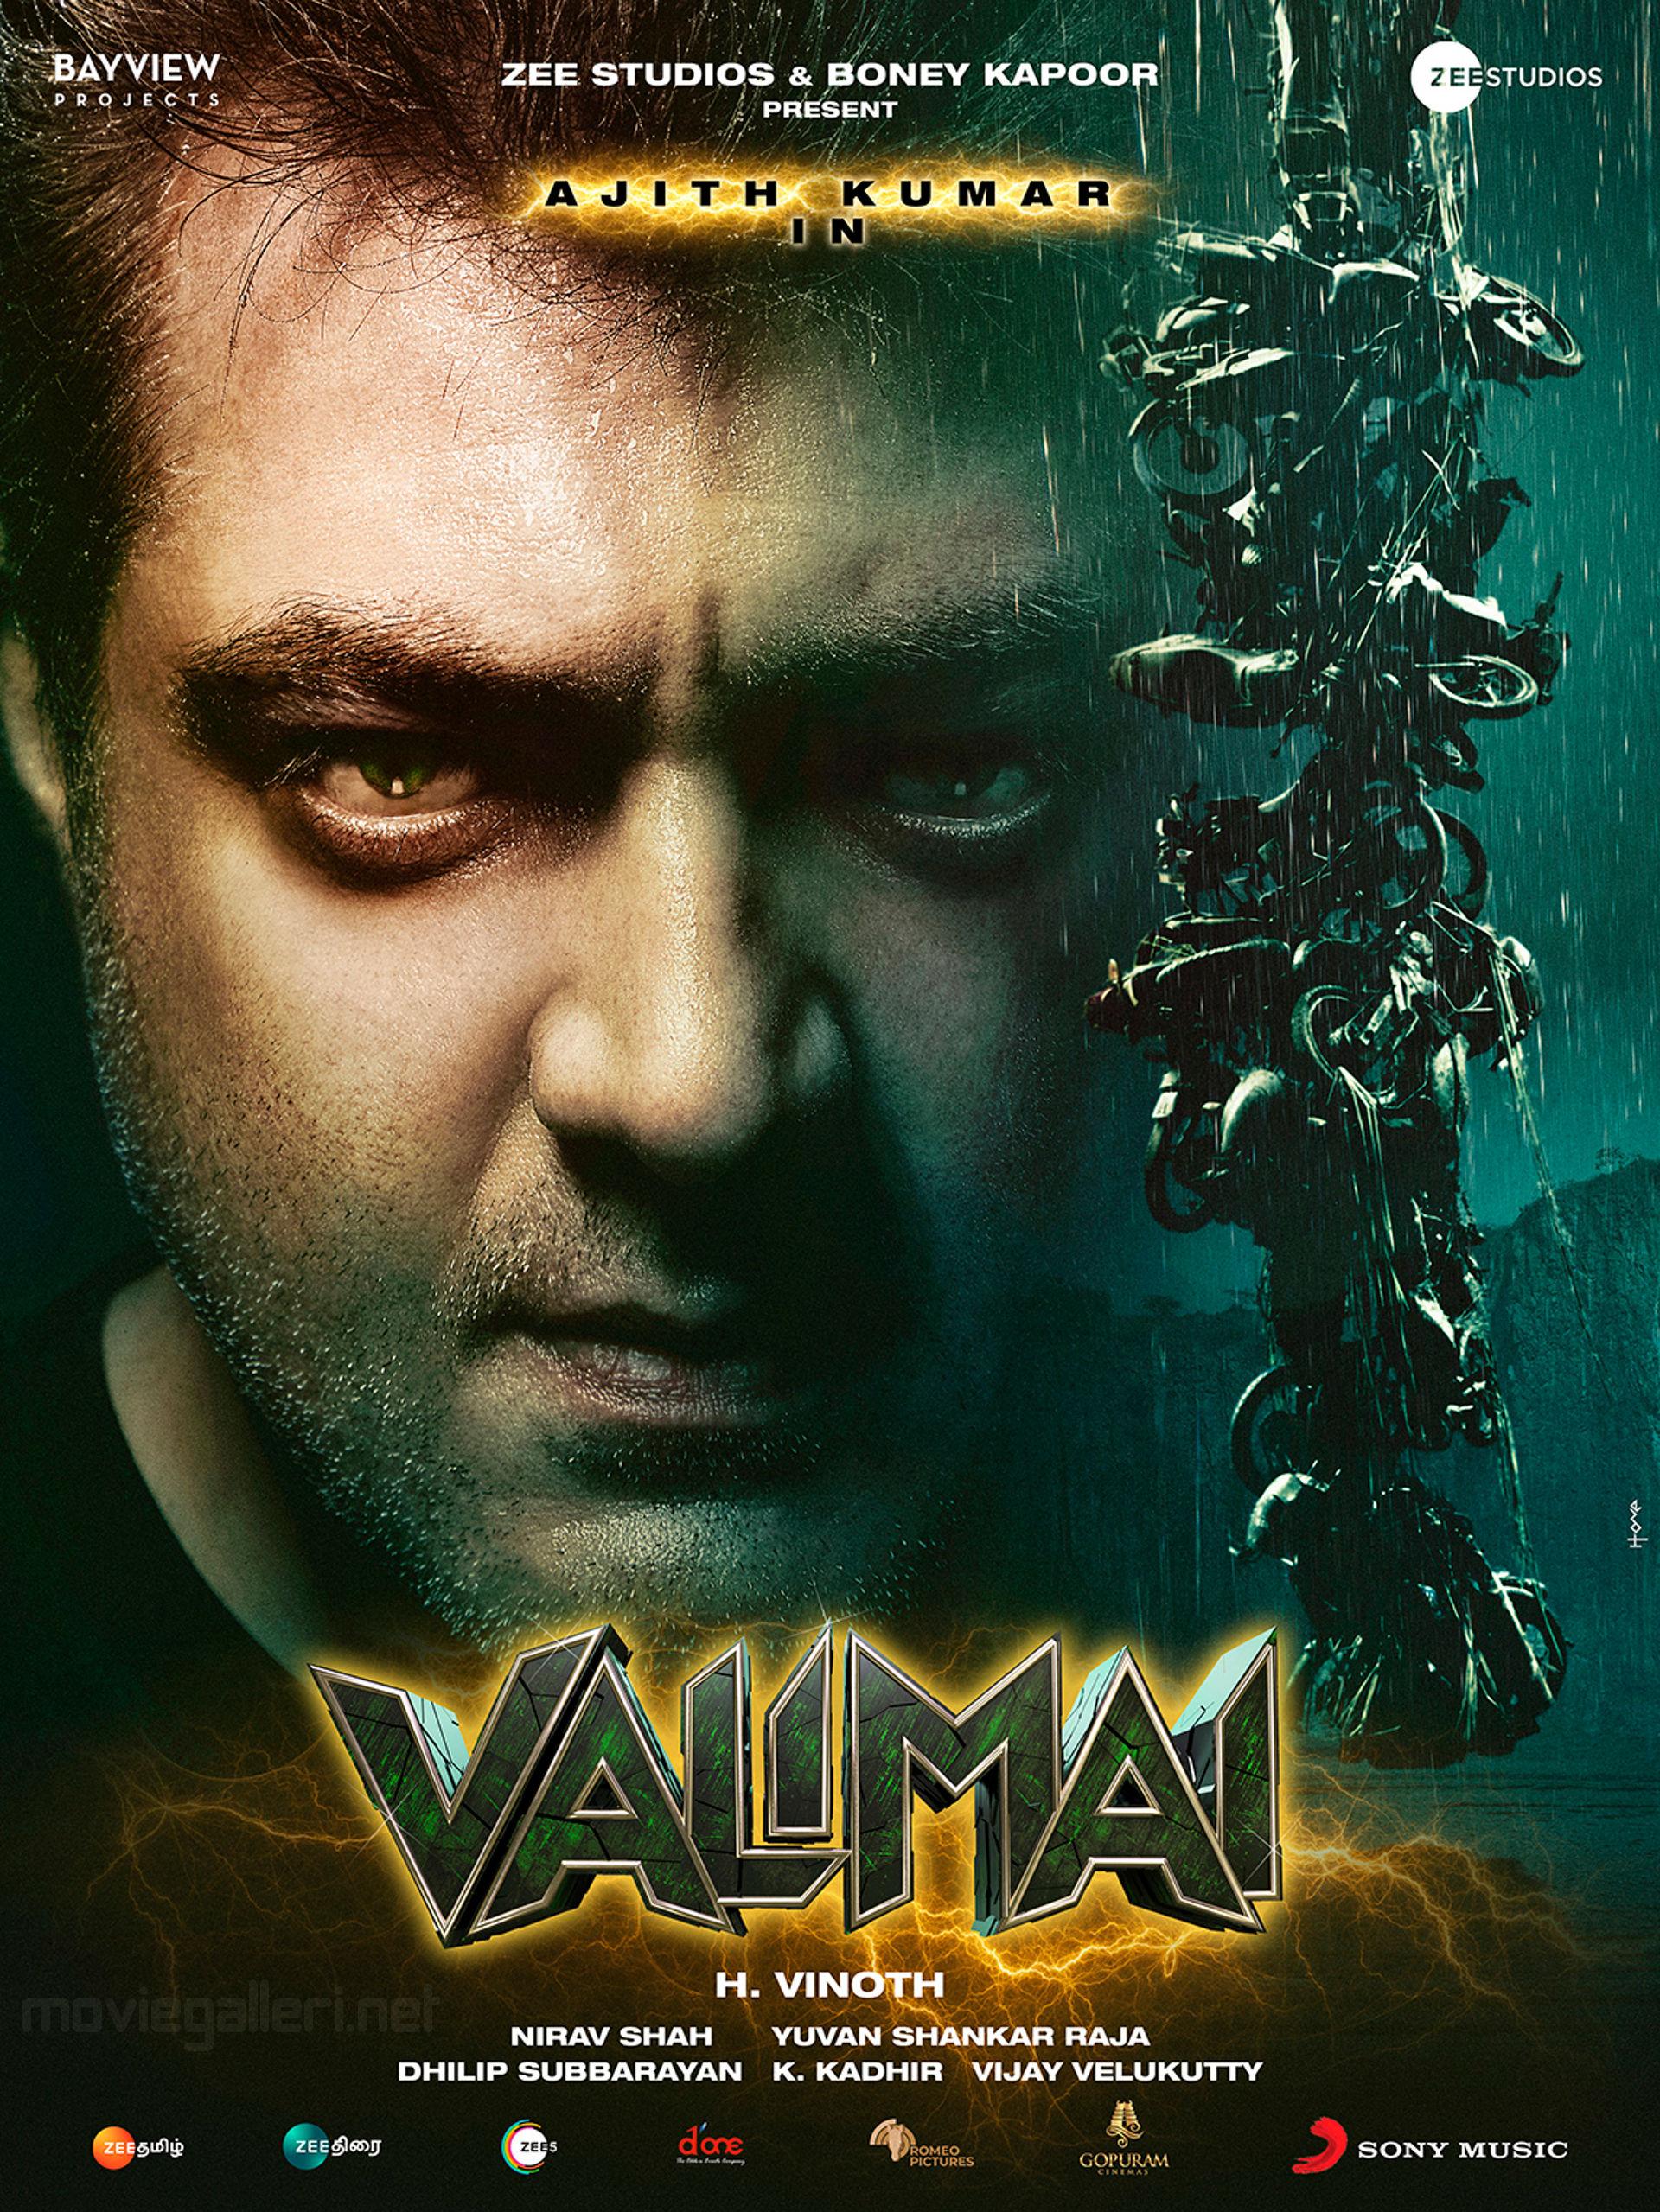 Ajith Kumar Valimai Movie First Look Poster HD